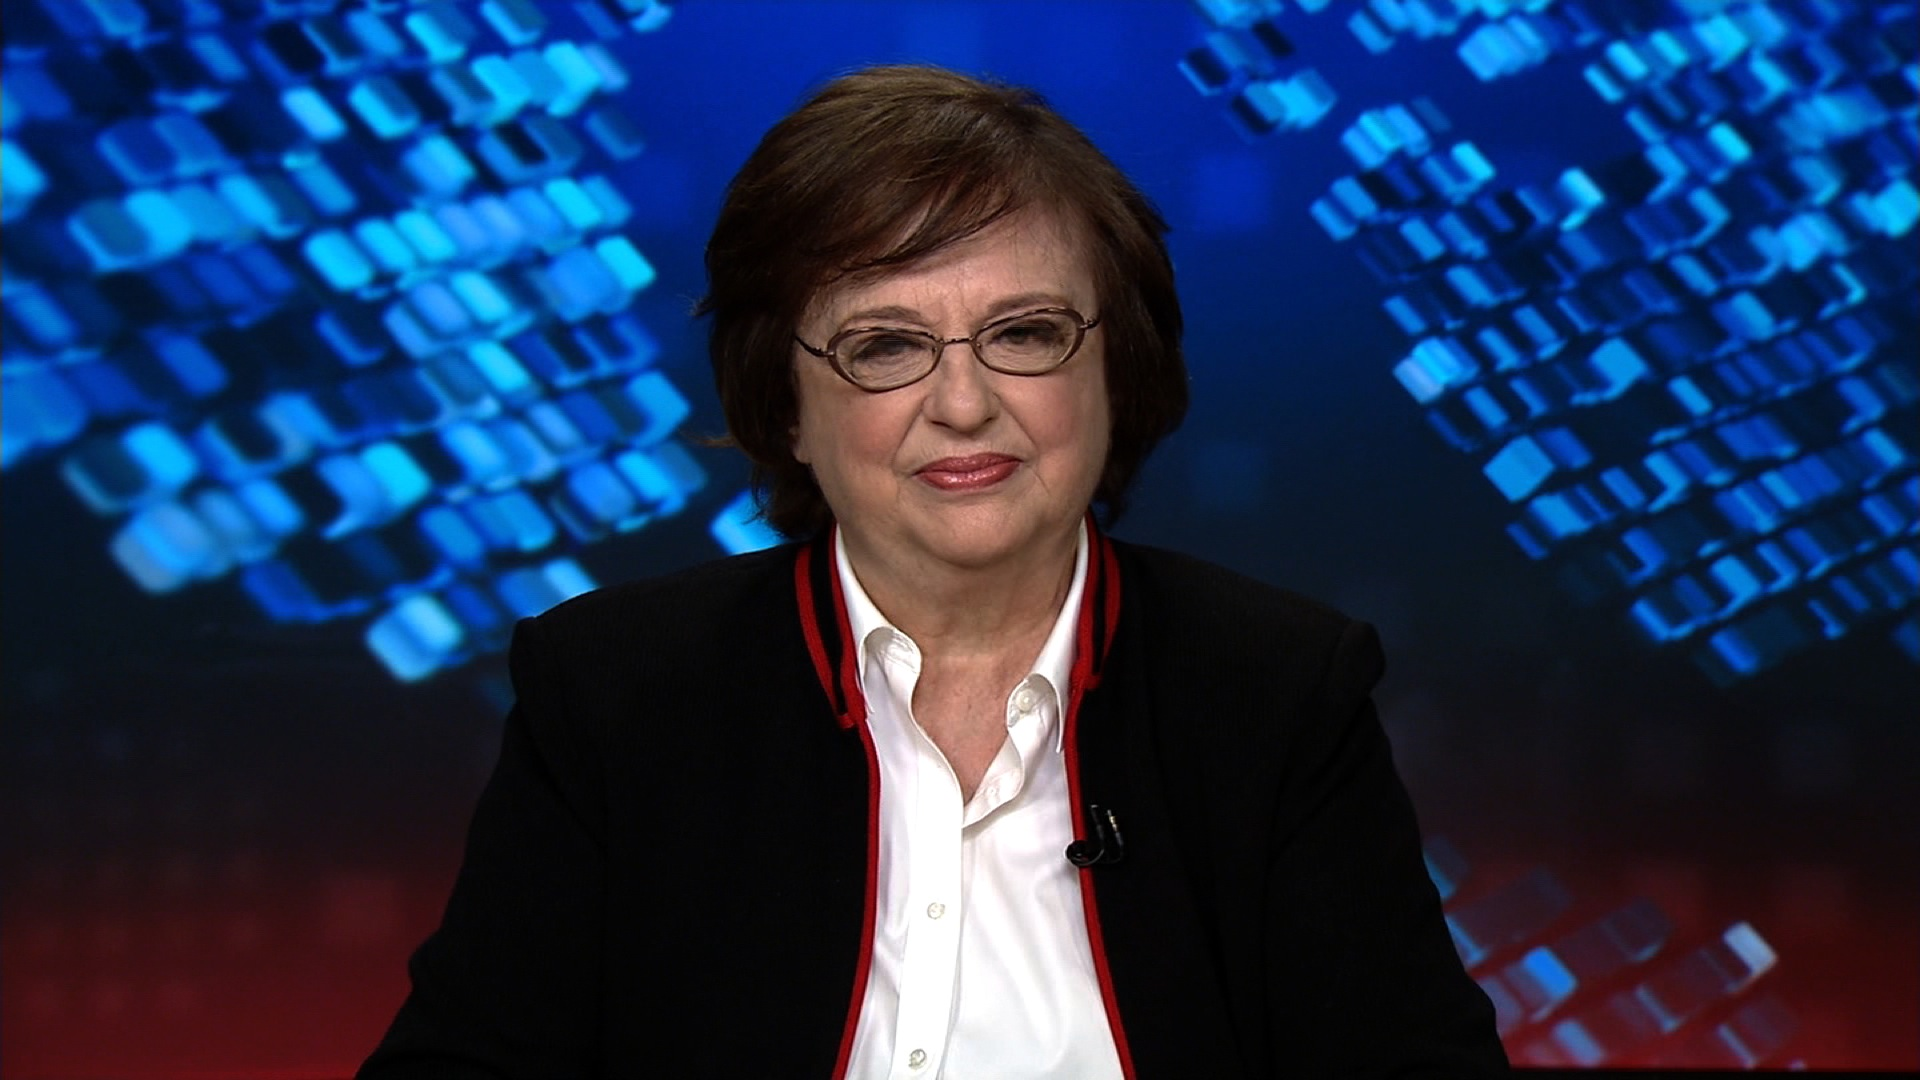 New York attorney general on suing Trump - CNN Video